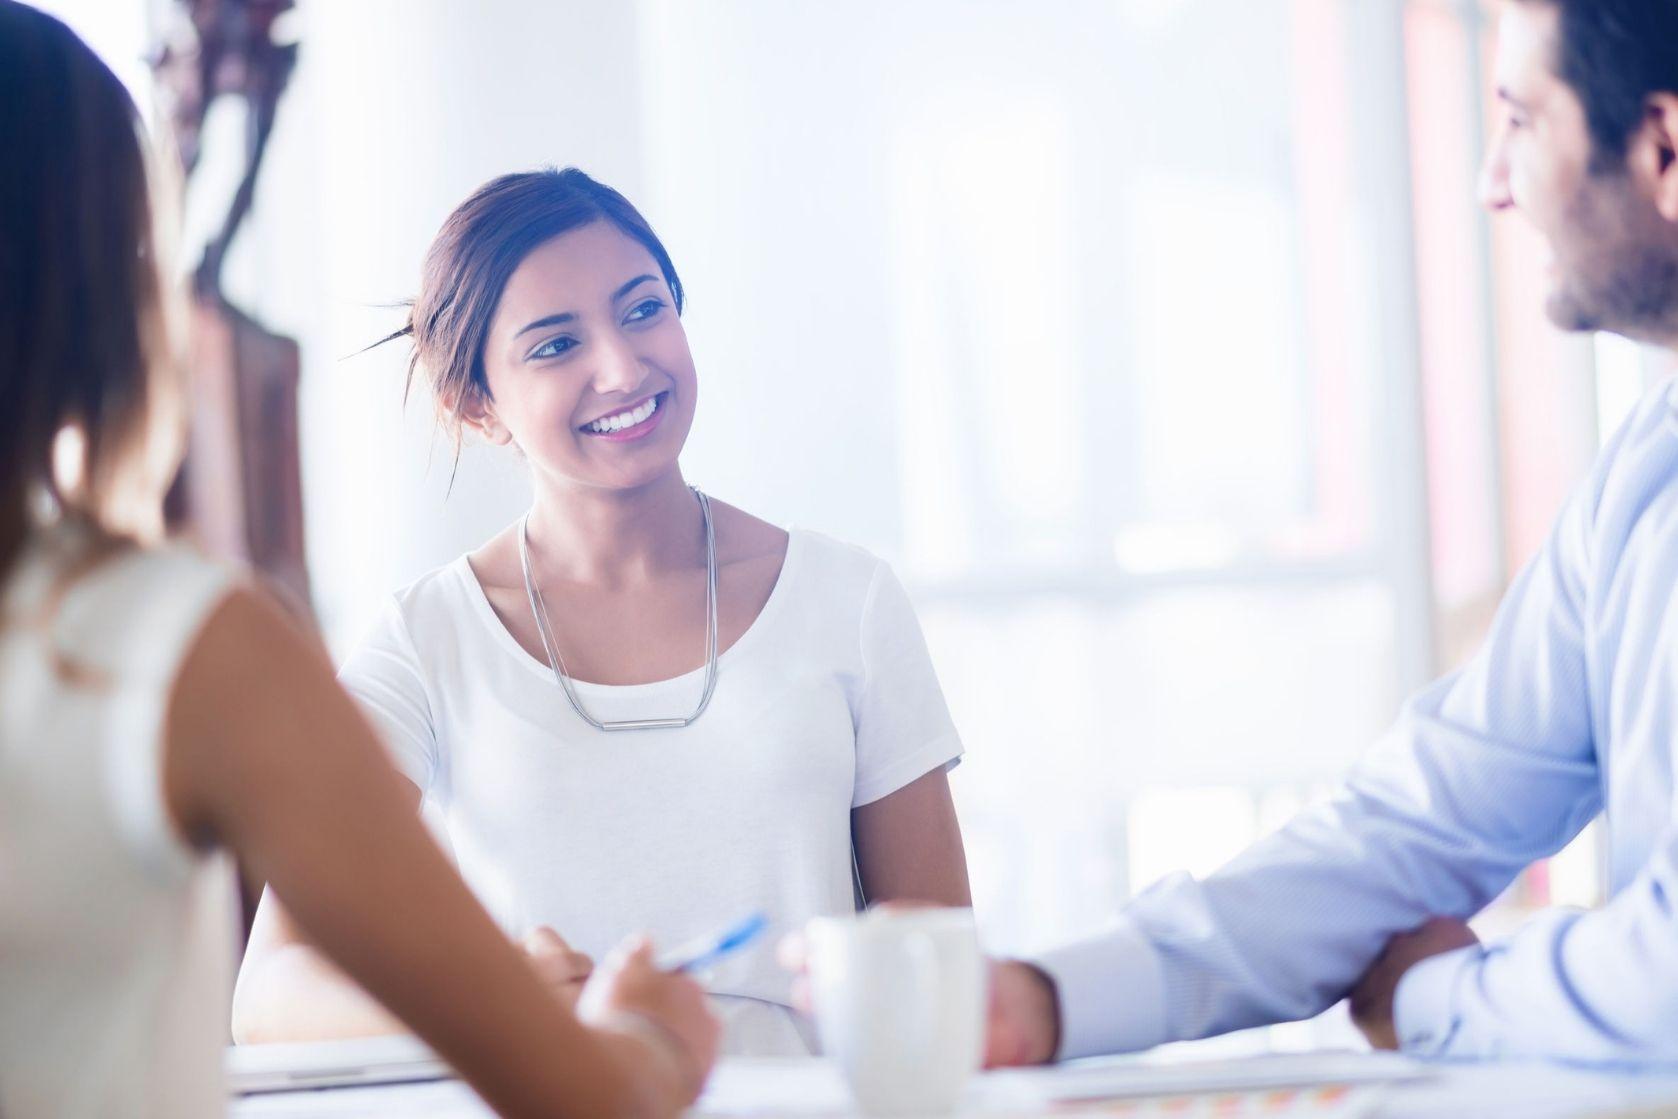 Resume Templates Australia, Resume samples, Resume Examples